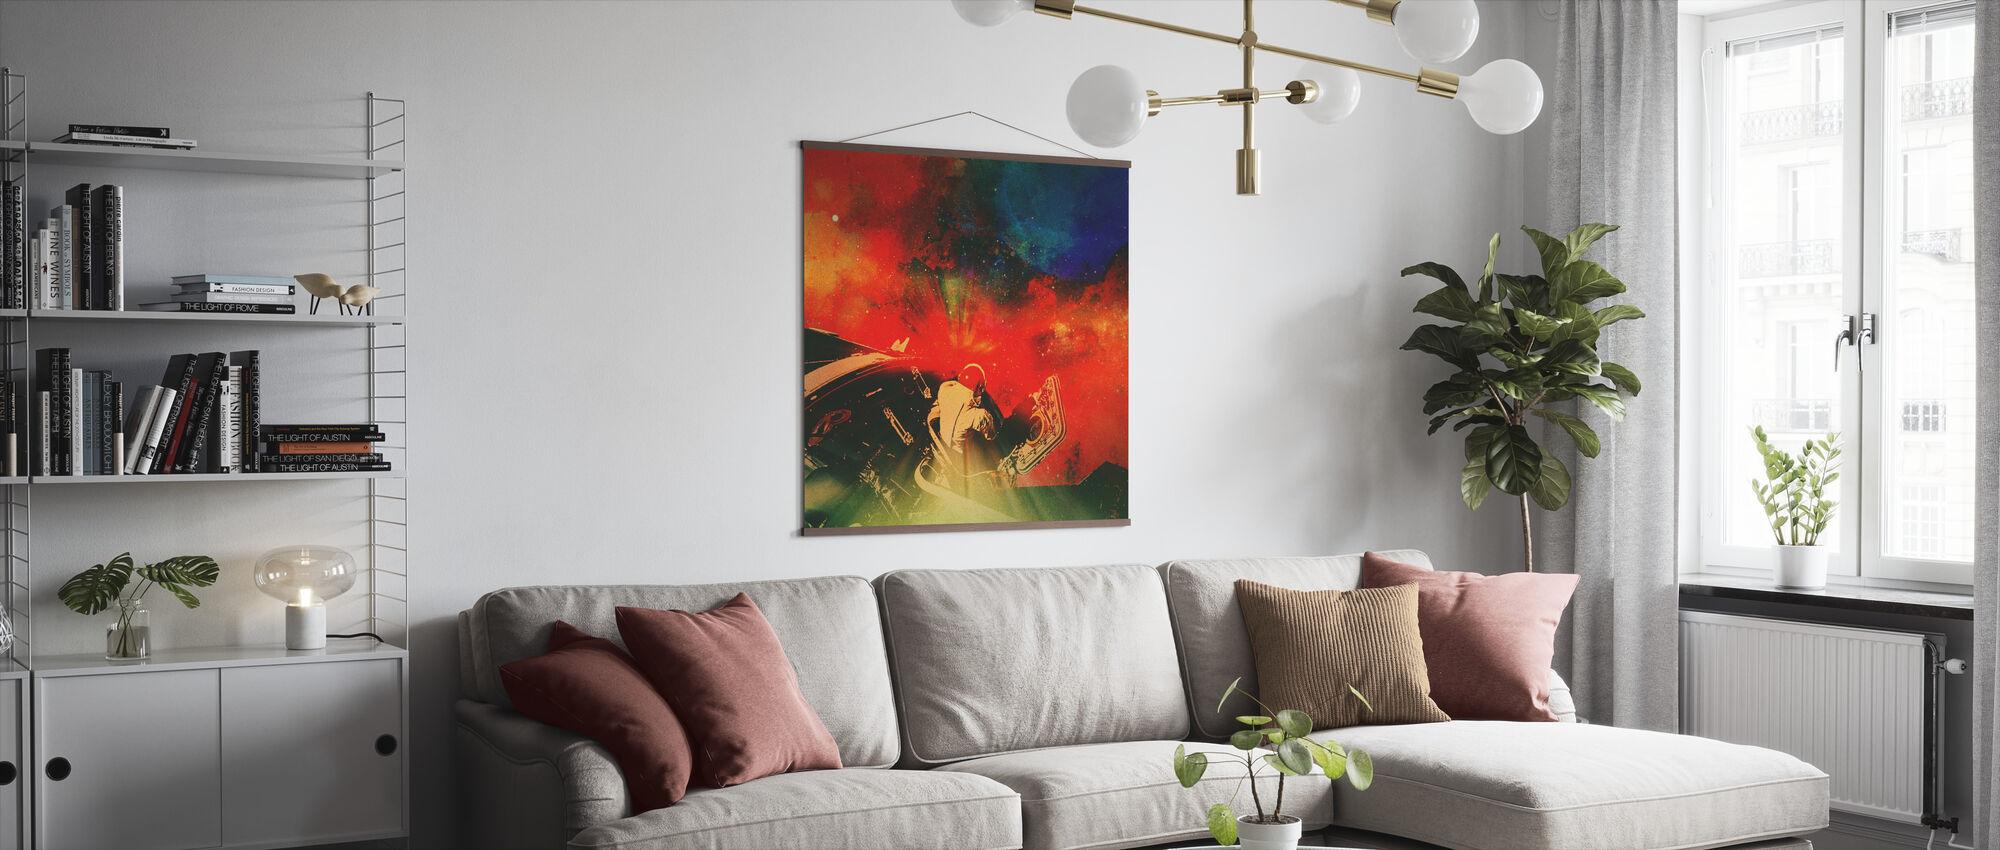 Psychonaut - Poster - Living Room